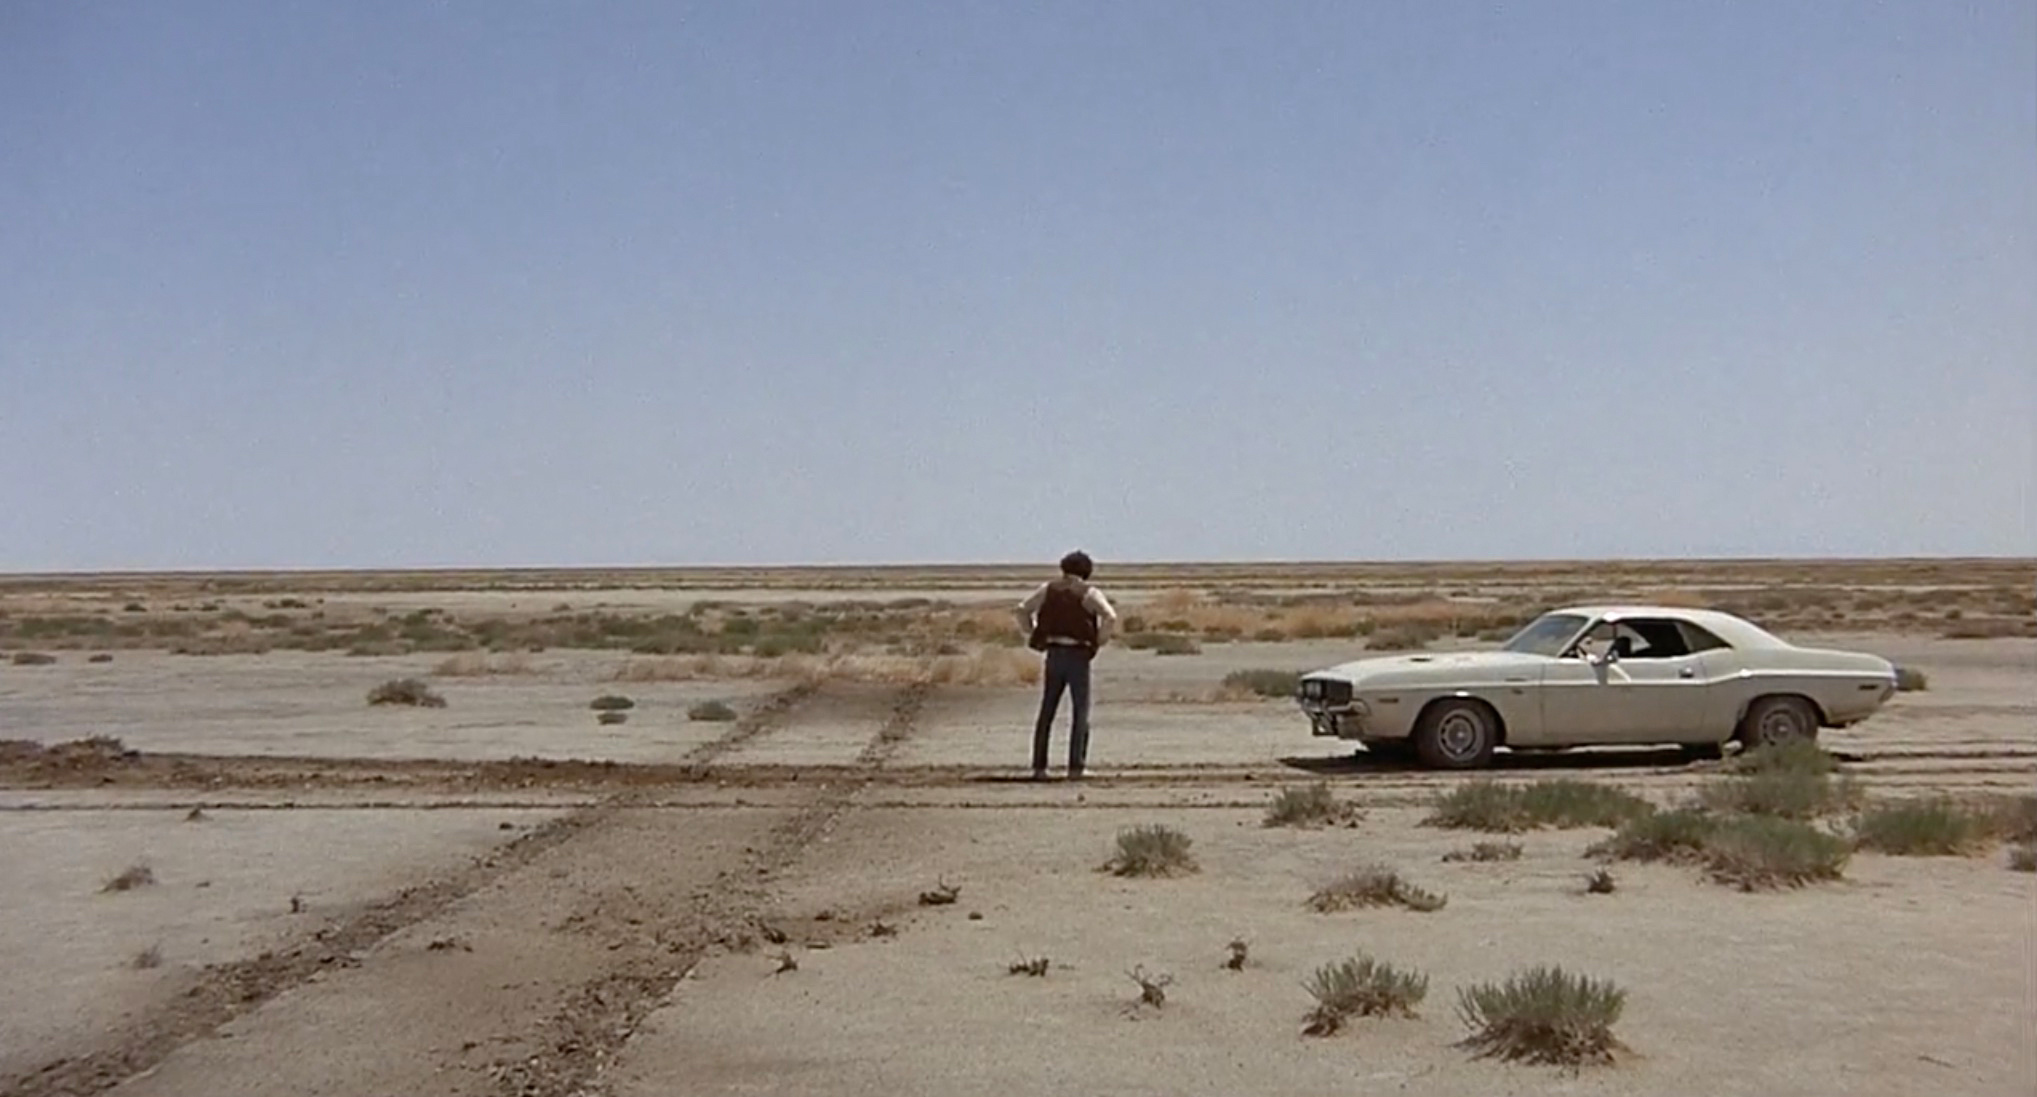 1970 Dodge Challenger R/T 440 Magnum desert stop